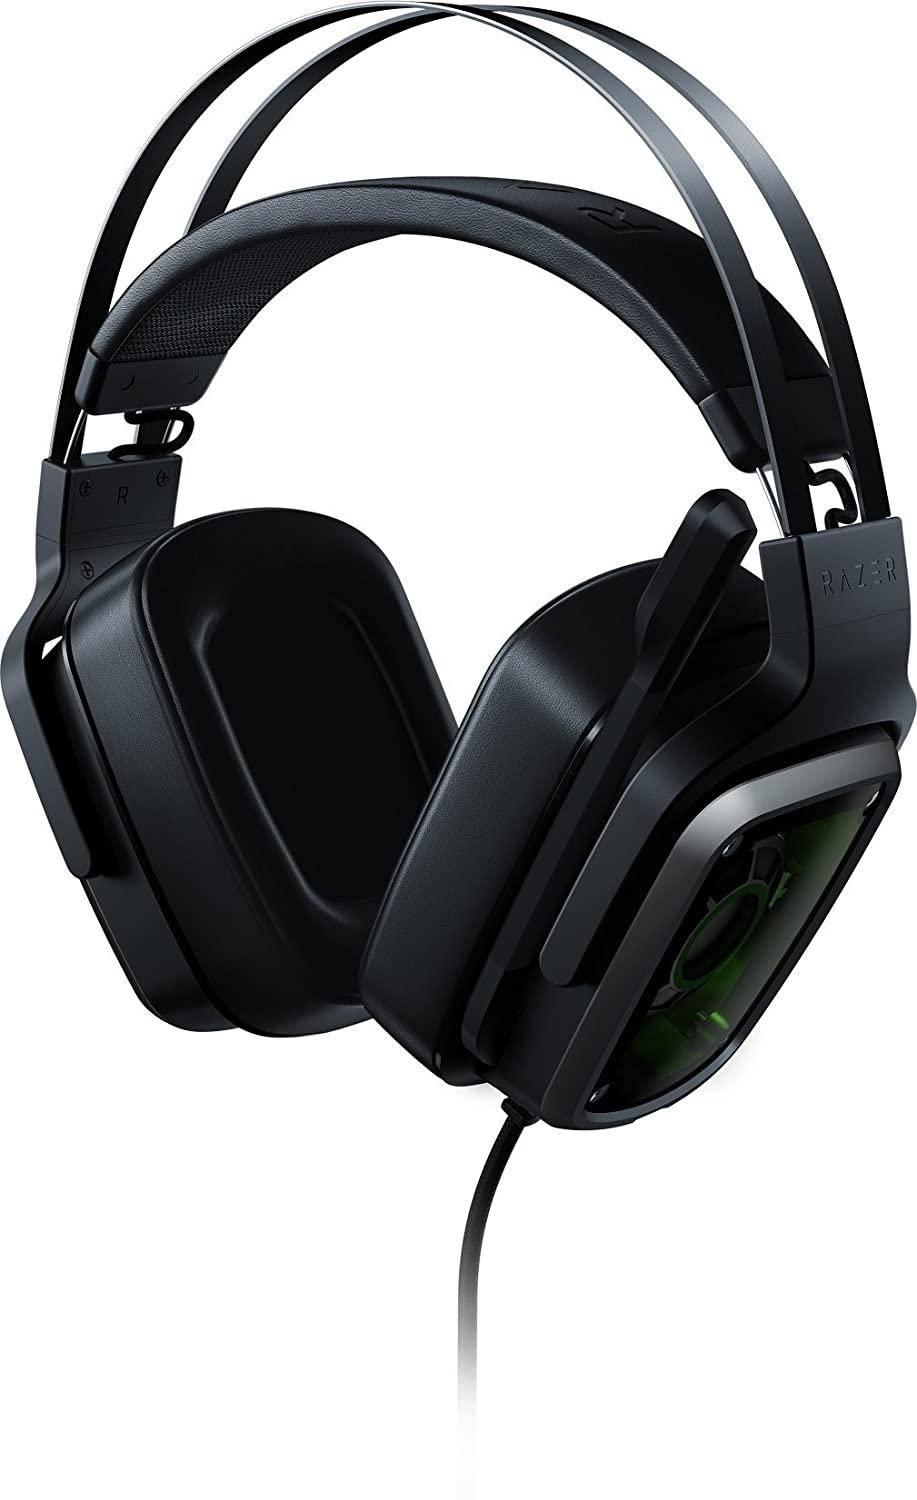 Razer Tiamat 7.1 V2 Analog/Digital Gaming Headset zoom image